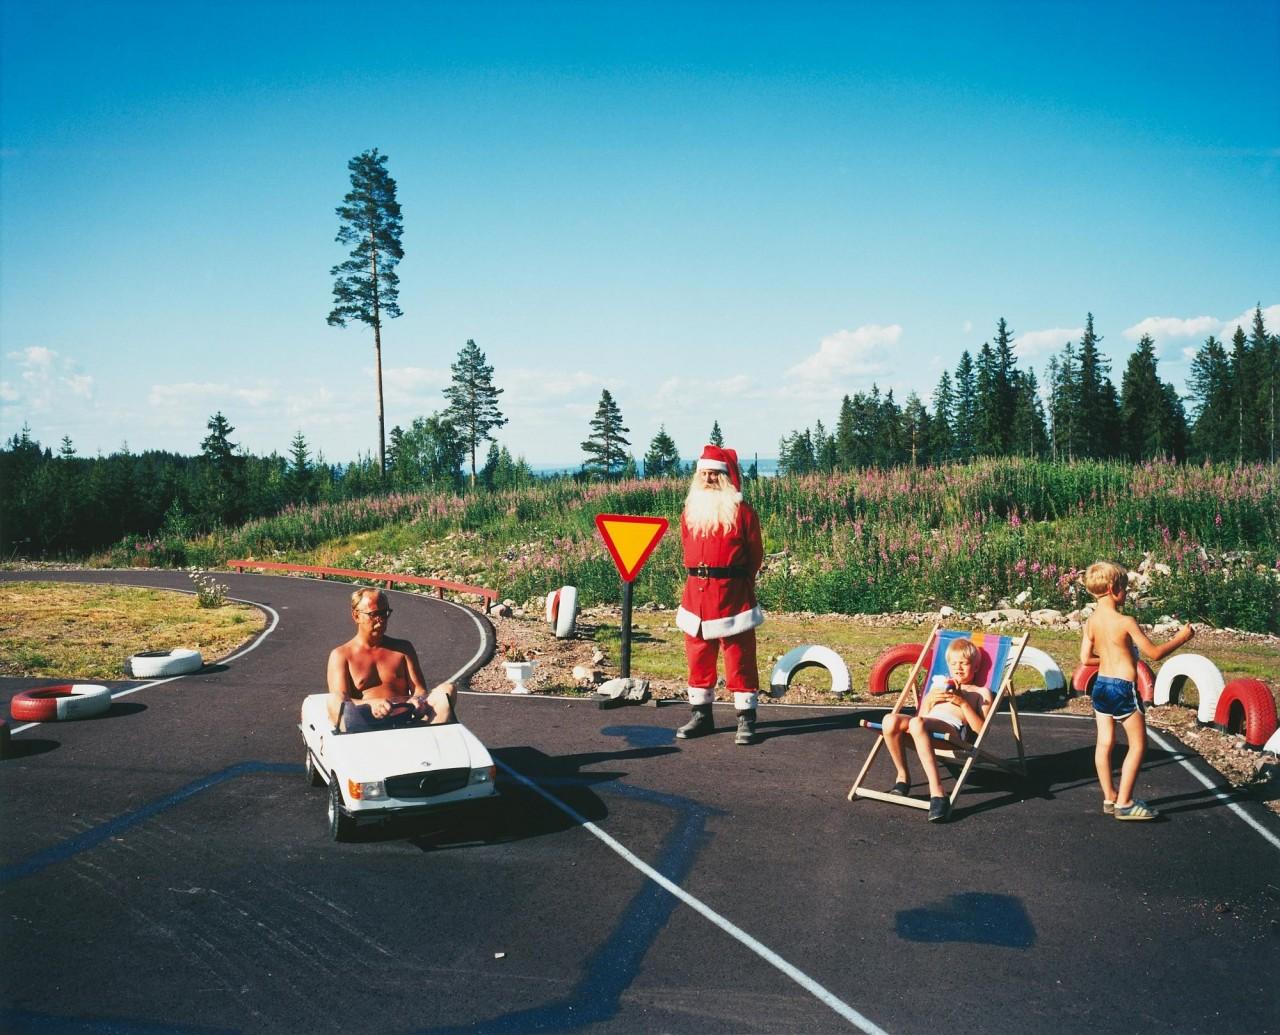 Из книги «Landet utom sig». Томтеленд, Мора, 1988. Фотограф Ларс Тунбьёрк